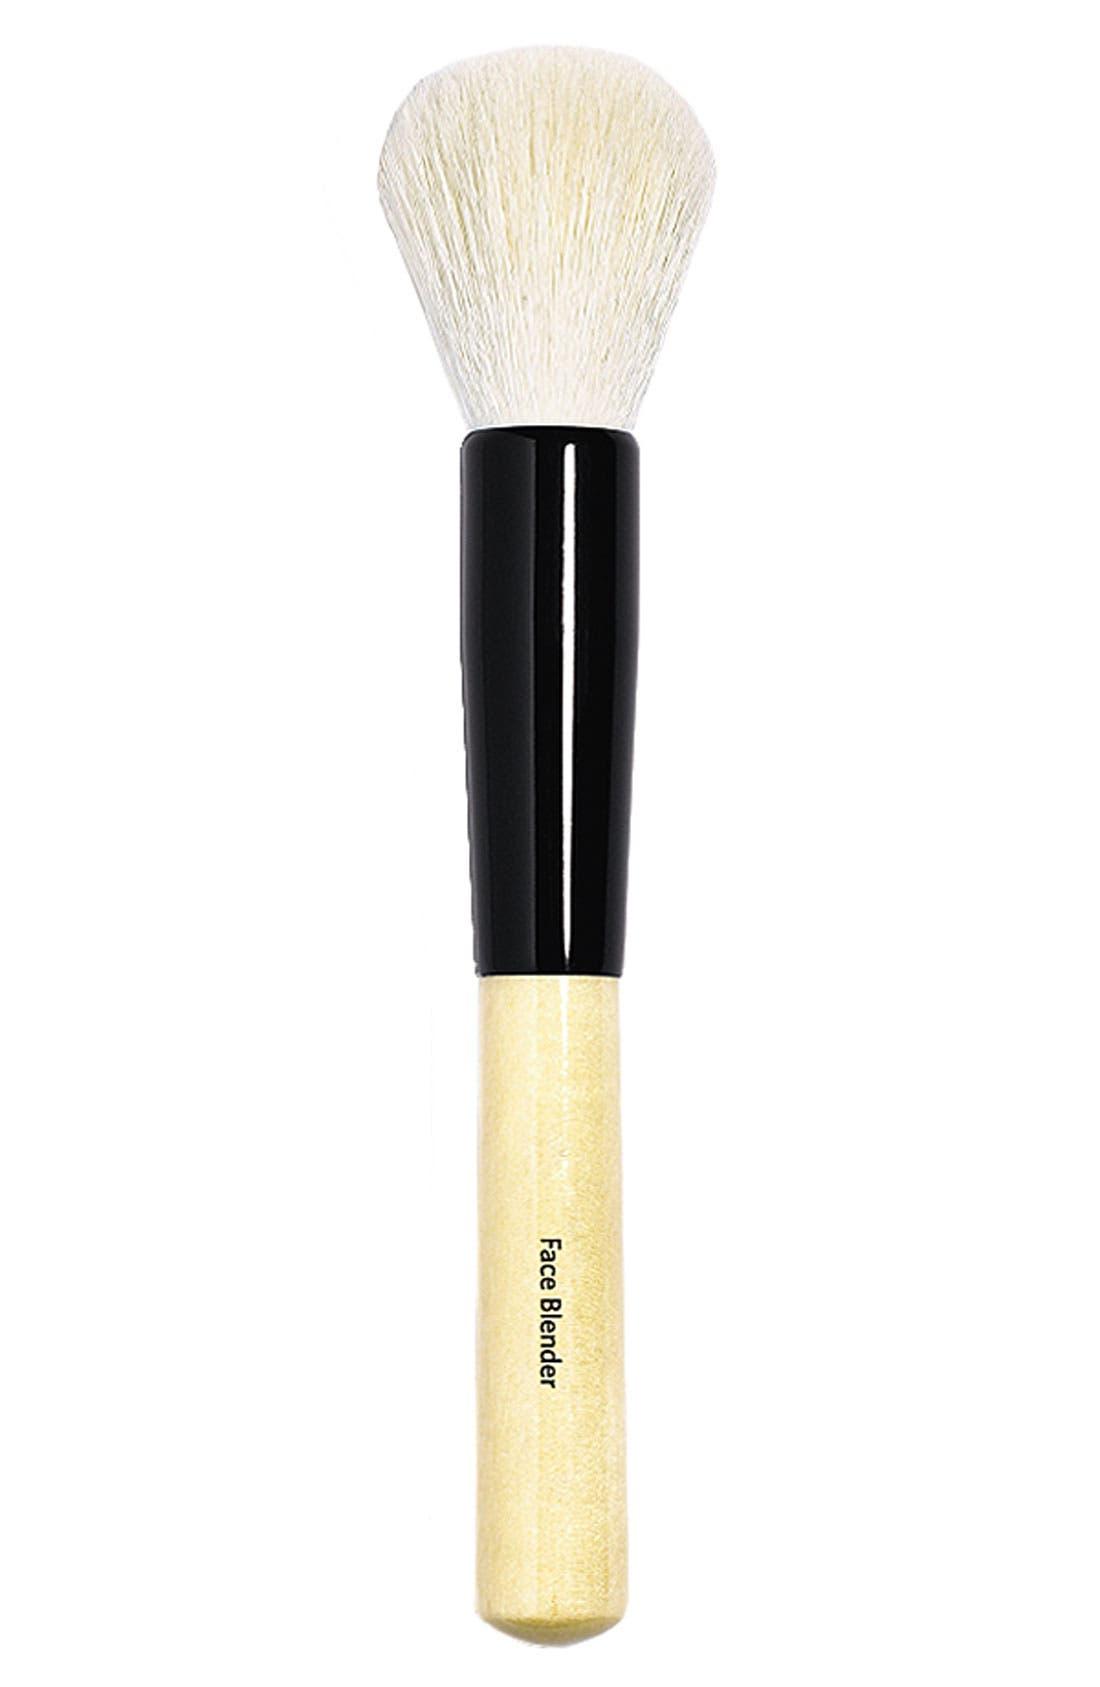 BOBBI BROWN,                             Face Blender Brush,                             Main thumbnail 1, color,                             000